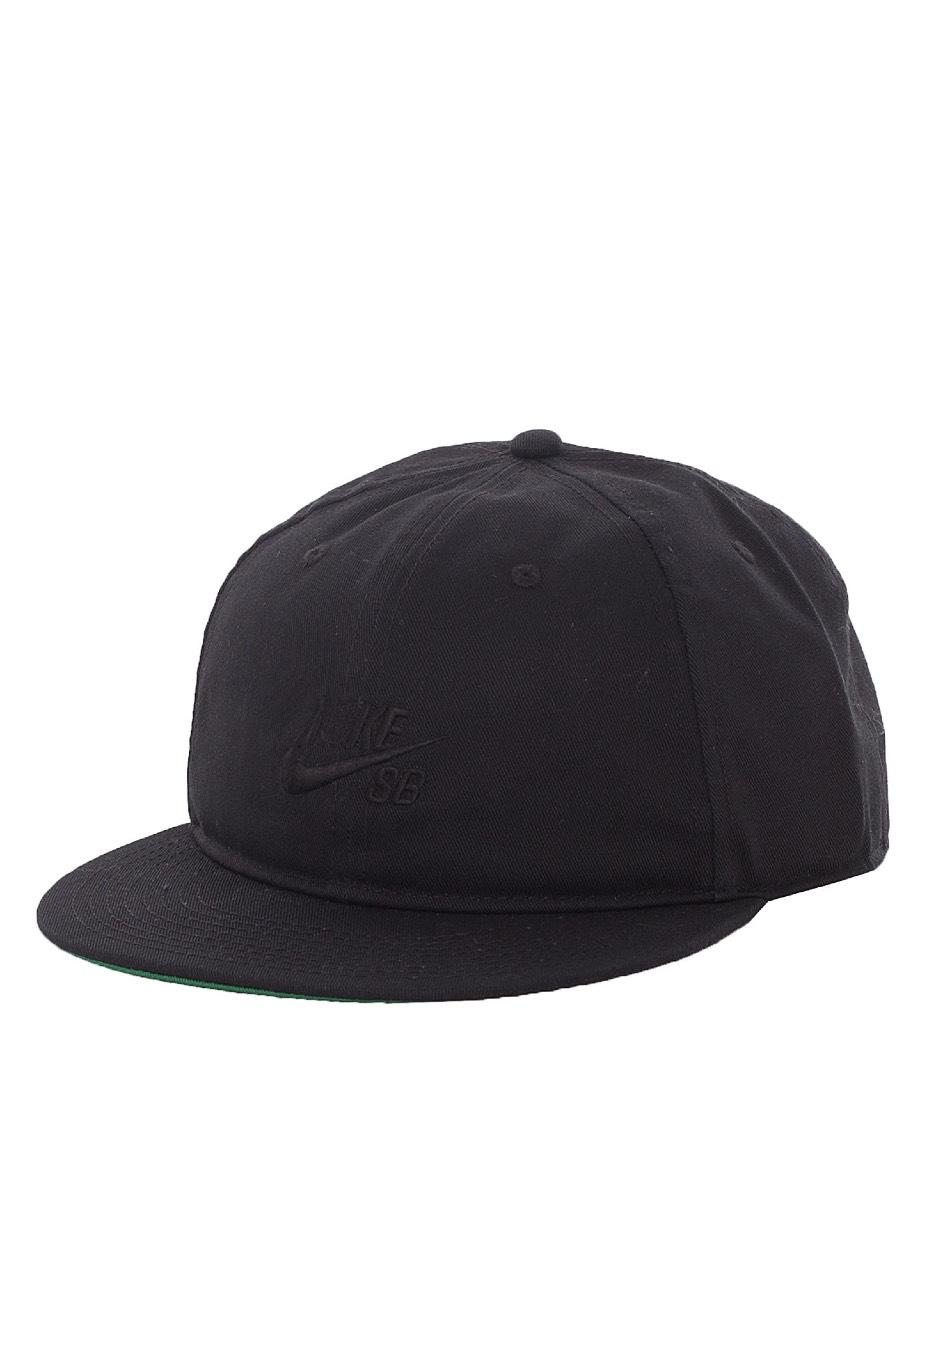 087cf426424 Nike - SB Pro Vintage Black Black - Cap - Streetwear Shop - Impericon.com UK